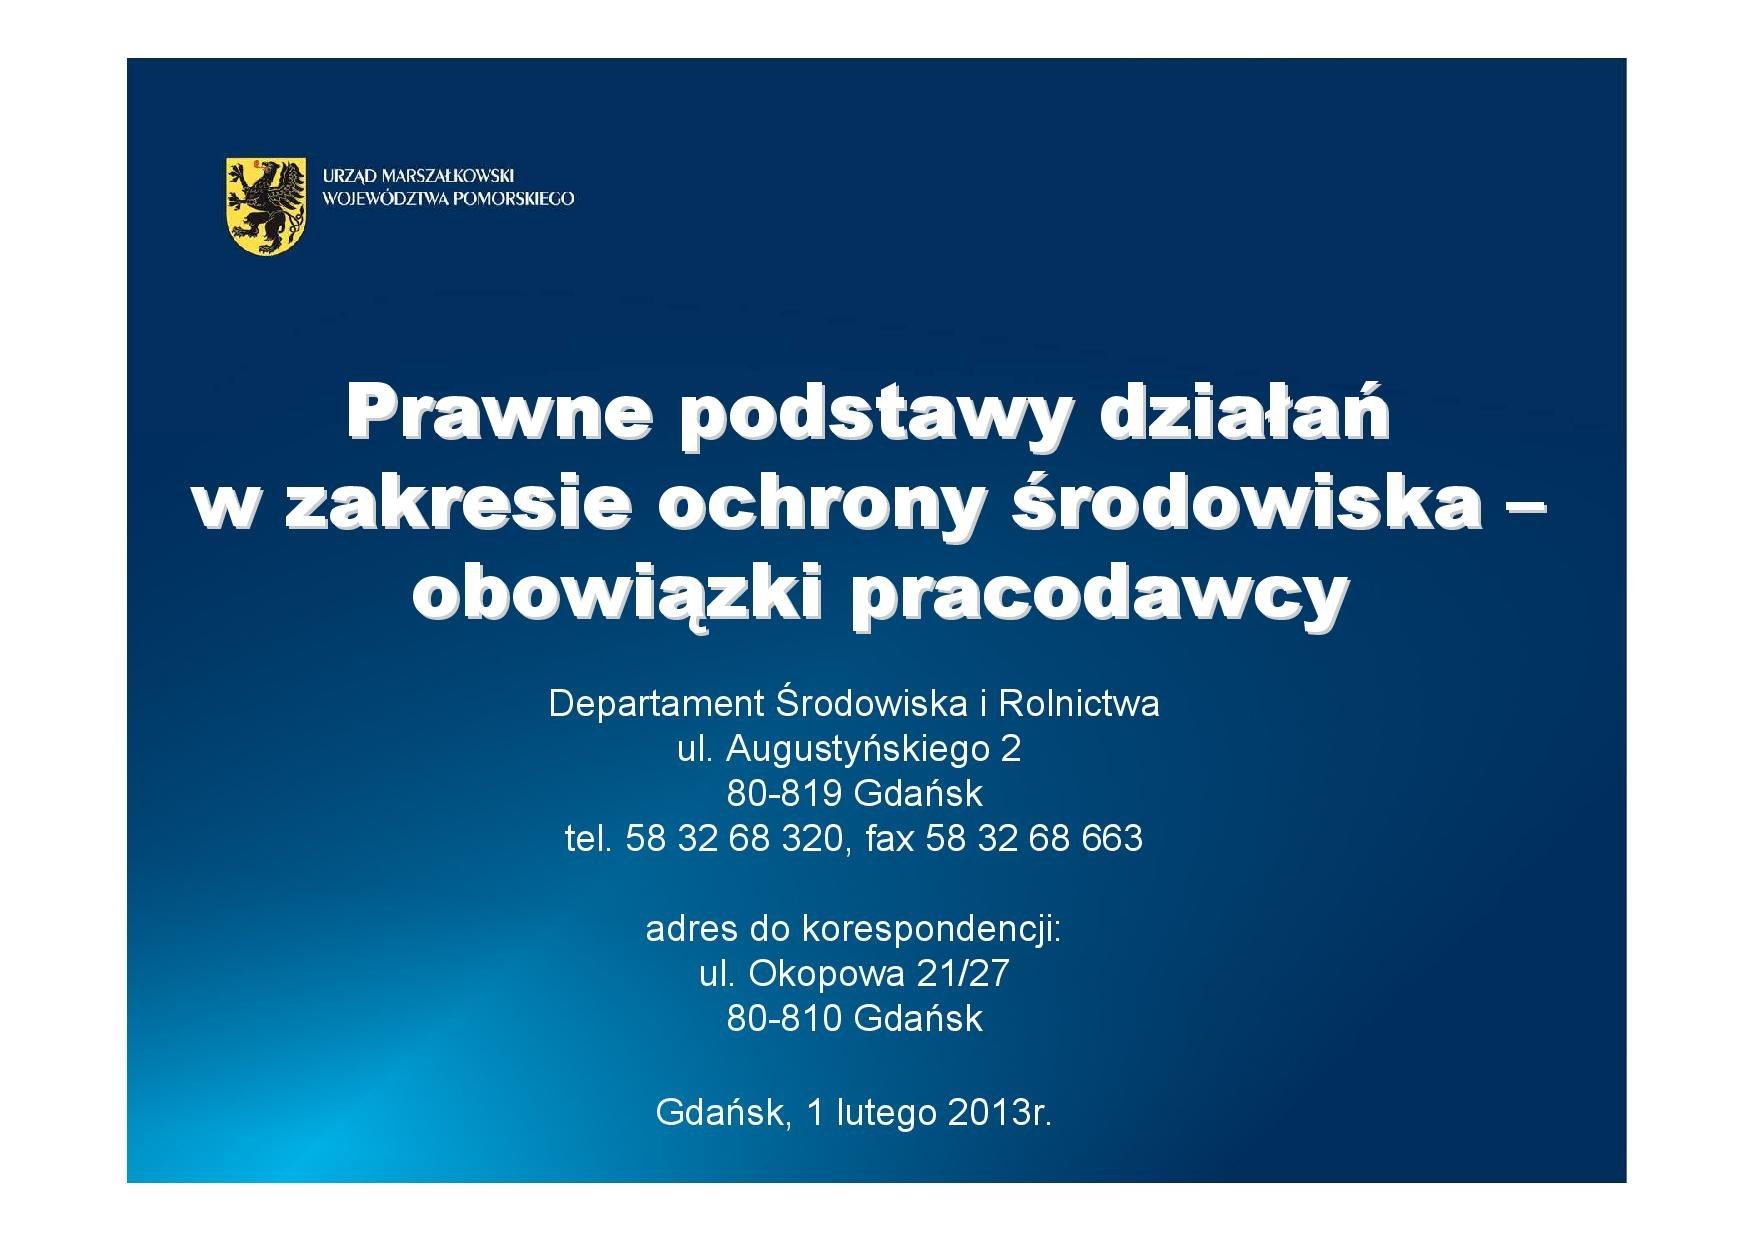 Ob. pracod. oplaty-page-001